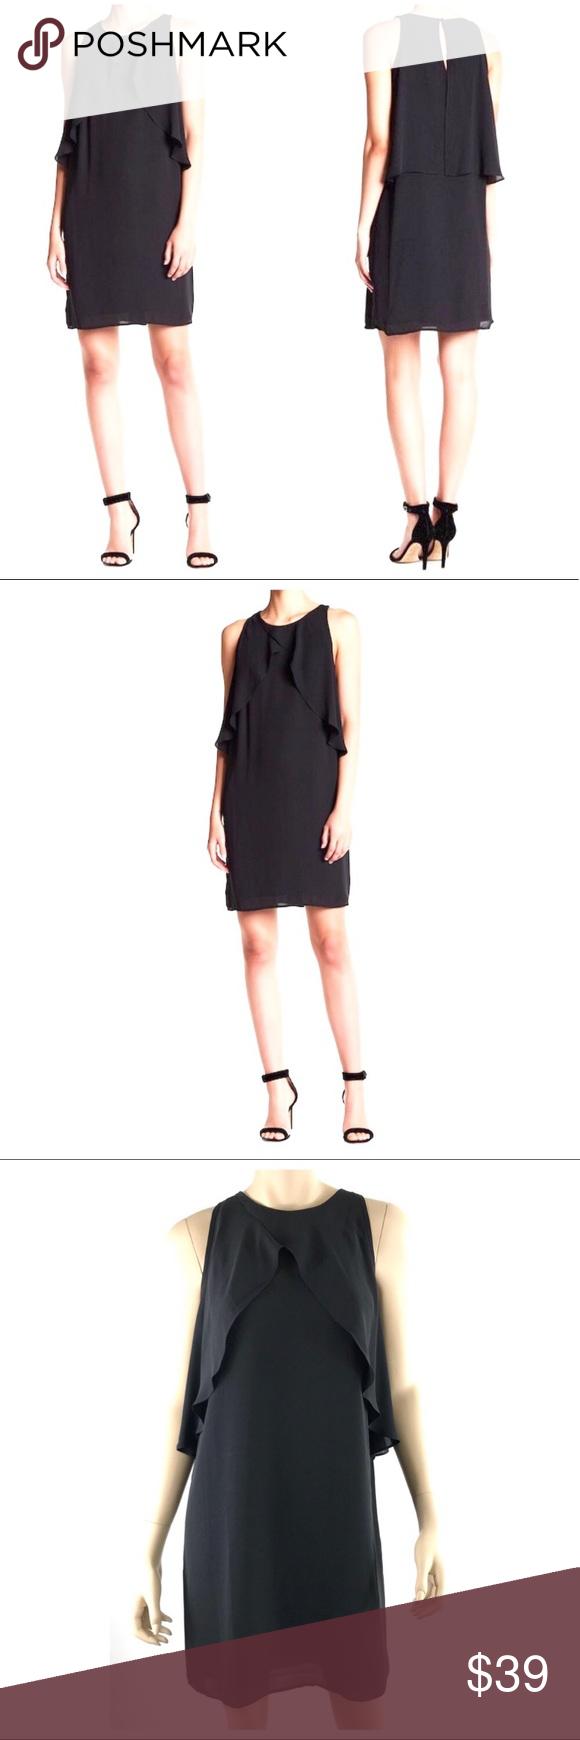 Vince Camuto Chiffon Flutter Drape Overlay Dress New With Tags Vince Camuto Lbd Dress Elegant Feminine Little Black Dress Chiff Overlay Dress Fashion Dresses [ 1740 x 580 Pixel ]